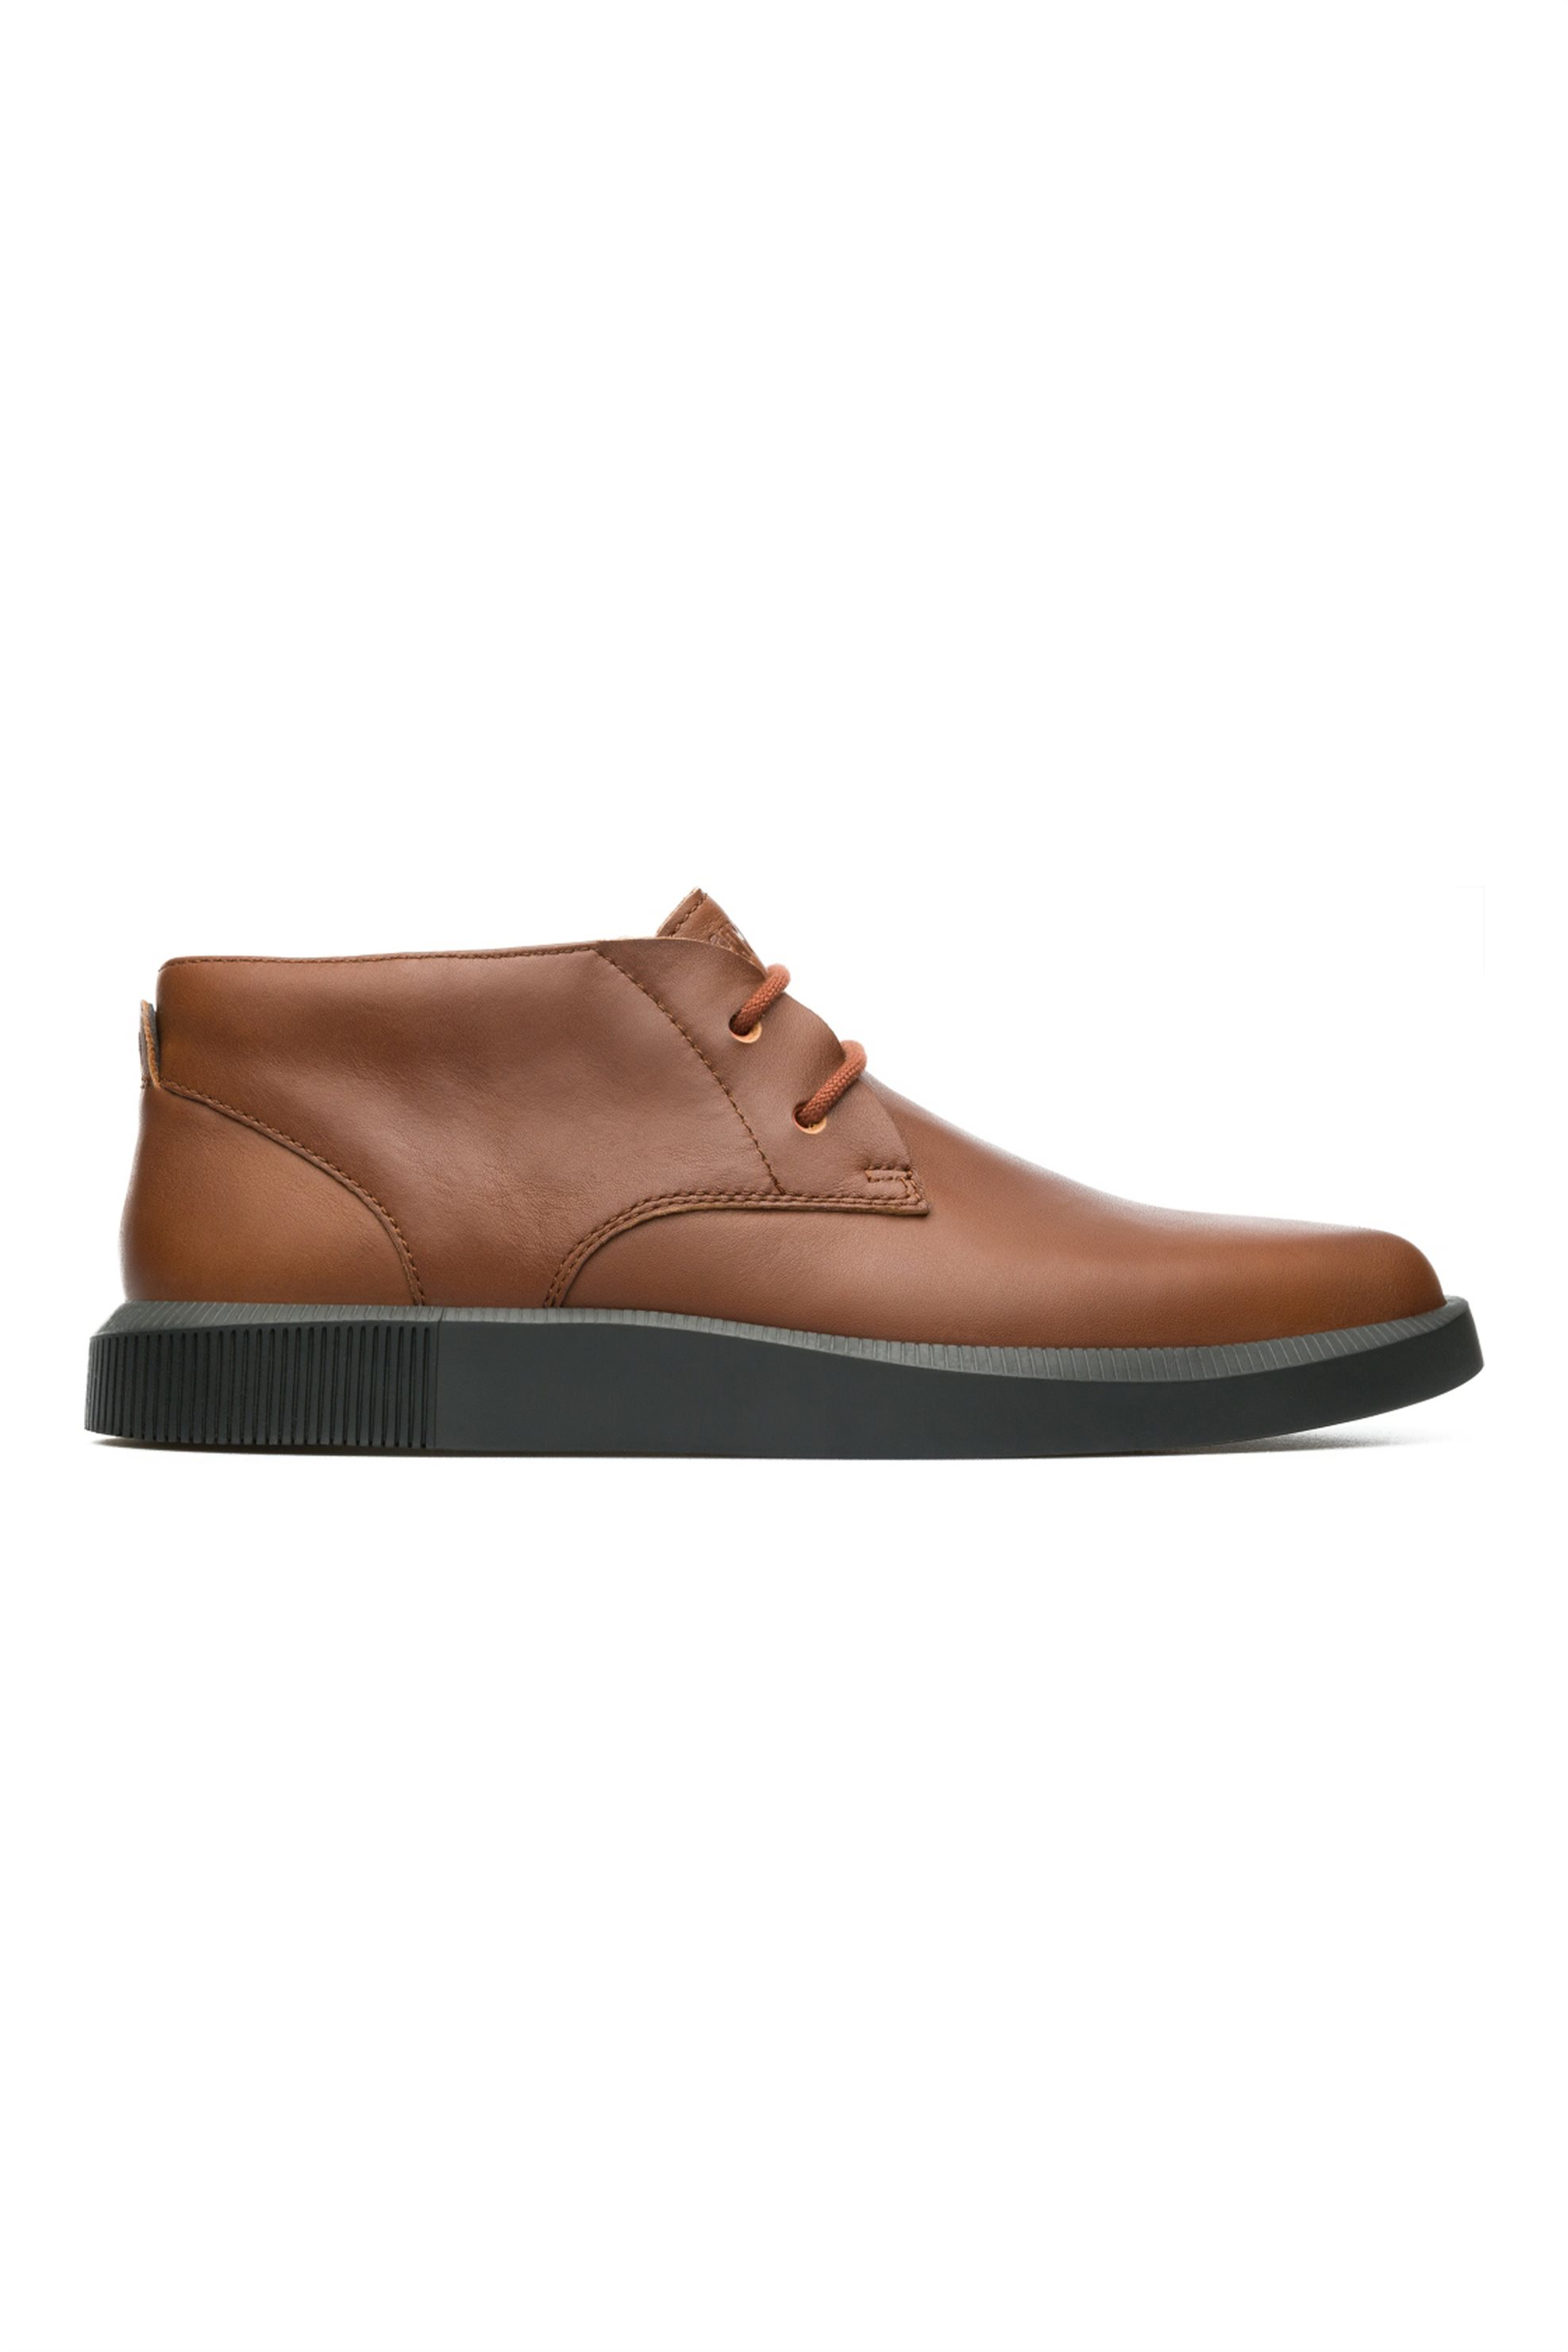 Notos Camper ανδρικά παπούτσια ταμπά με κορδόνια δερμάτινα Bill –  K300235-003 – Ταμπά 82f82eed624